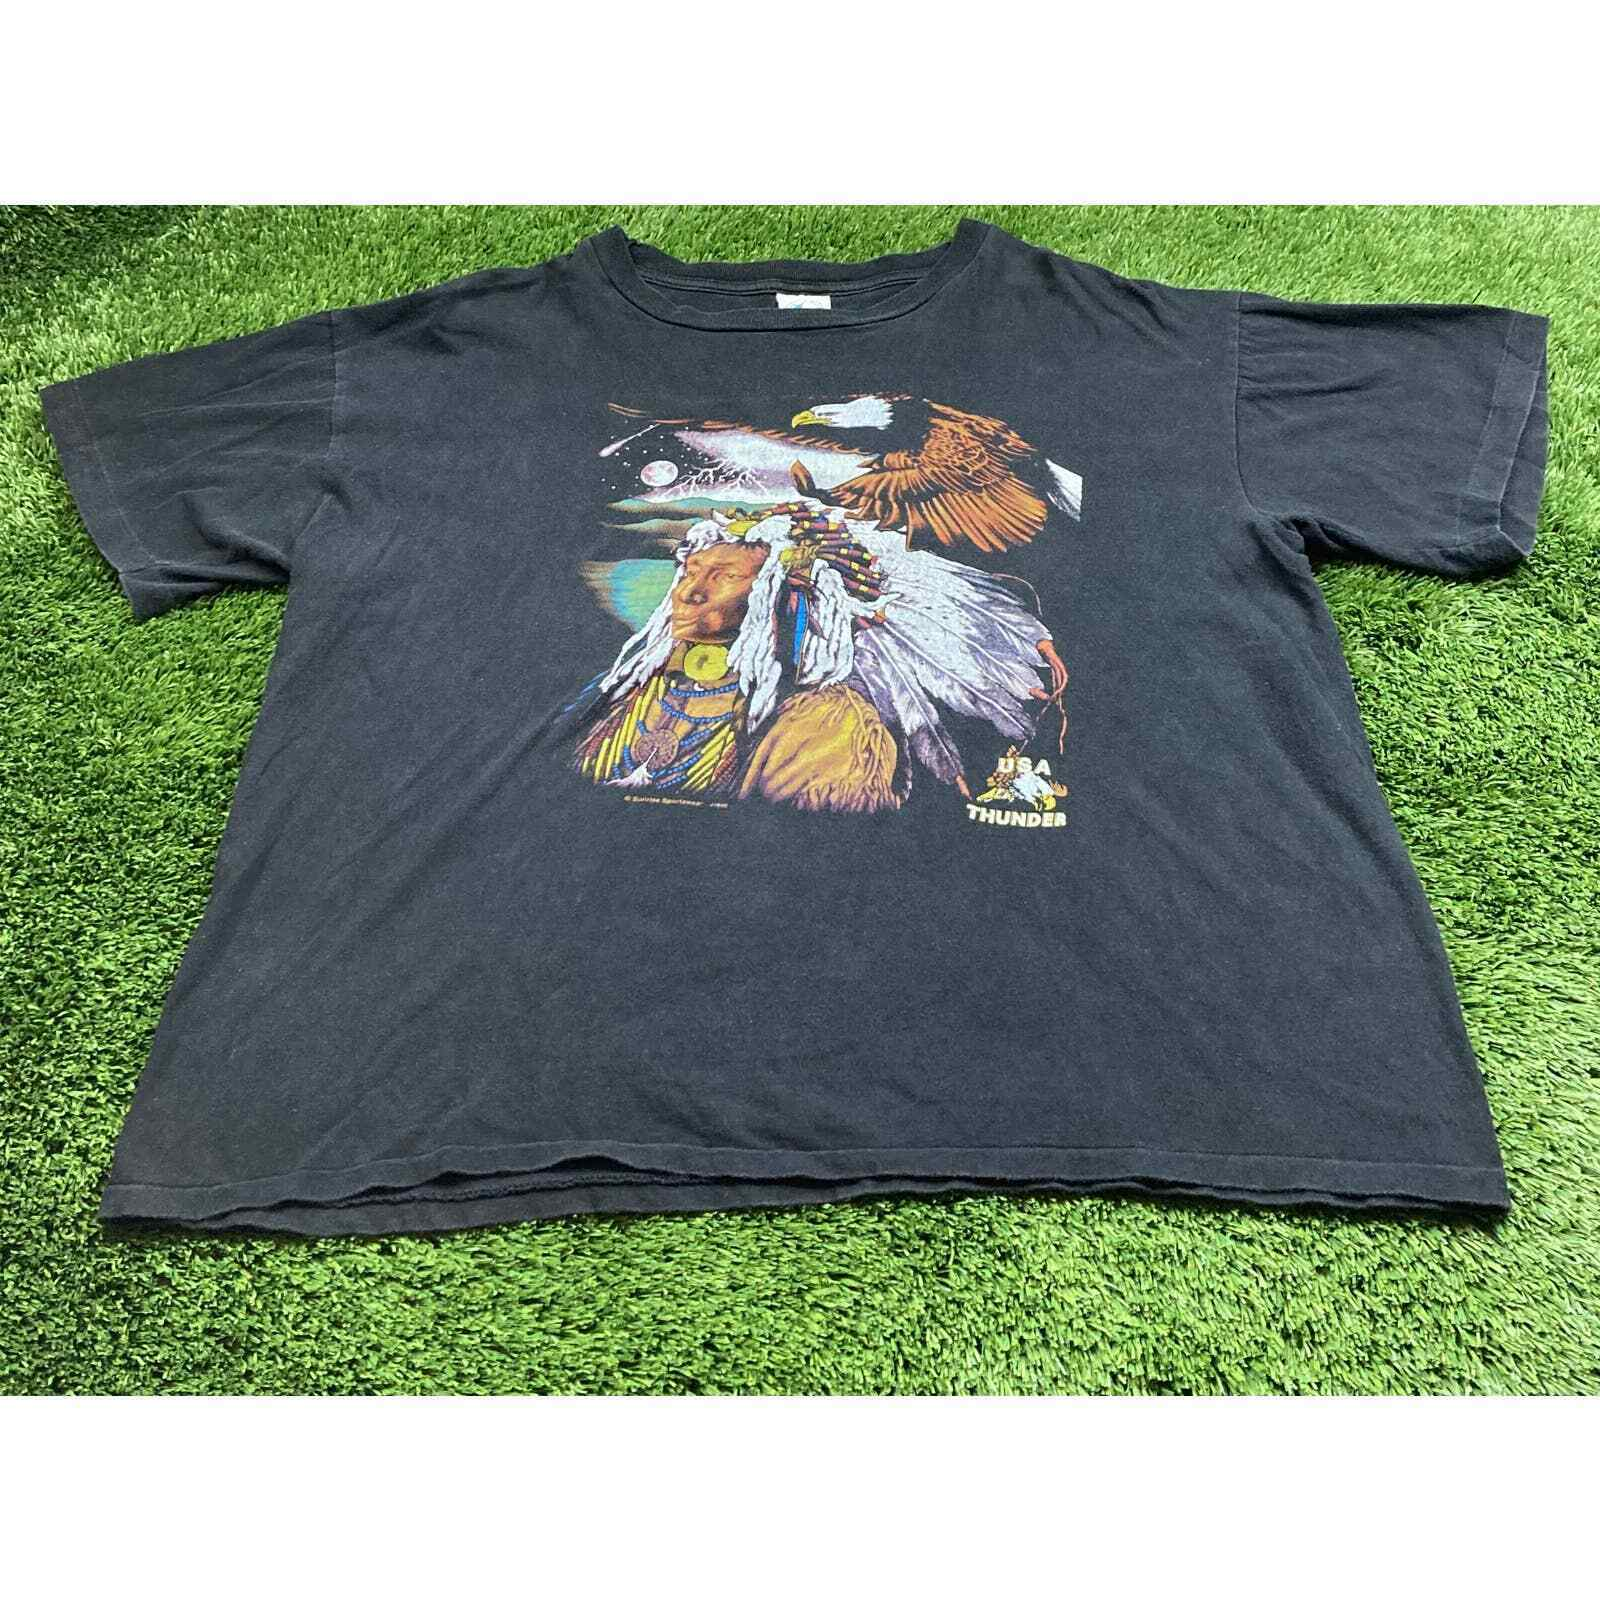 Neon WILD /& FREE Chief T-shirt-Small